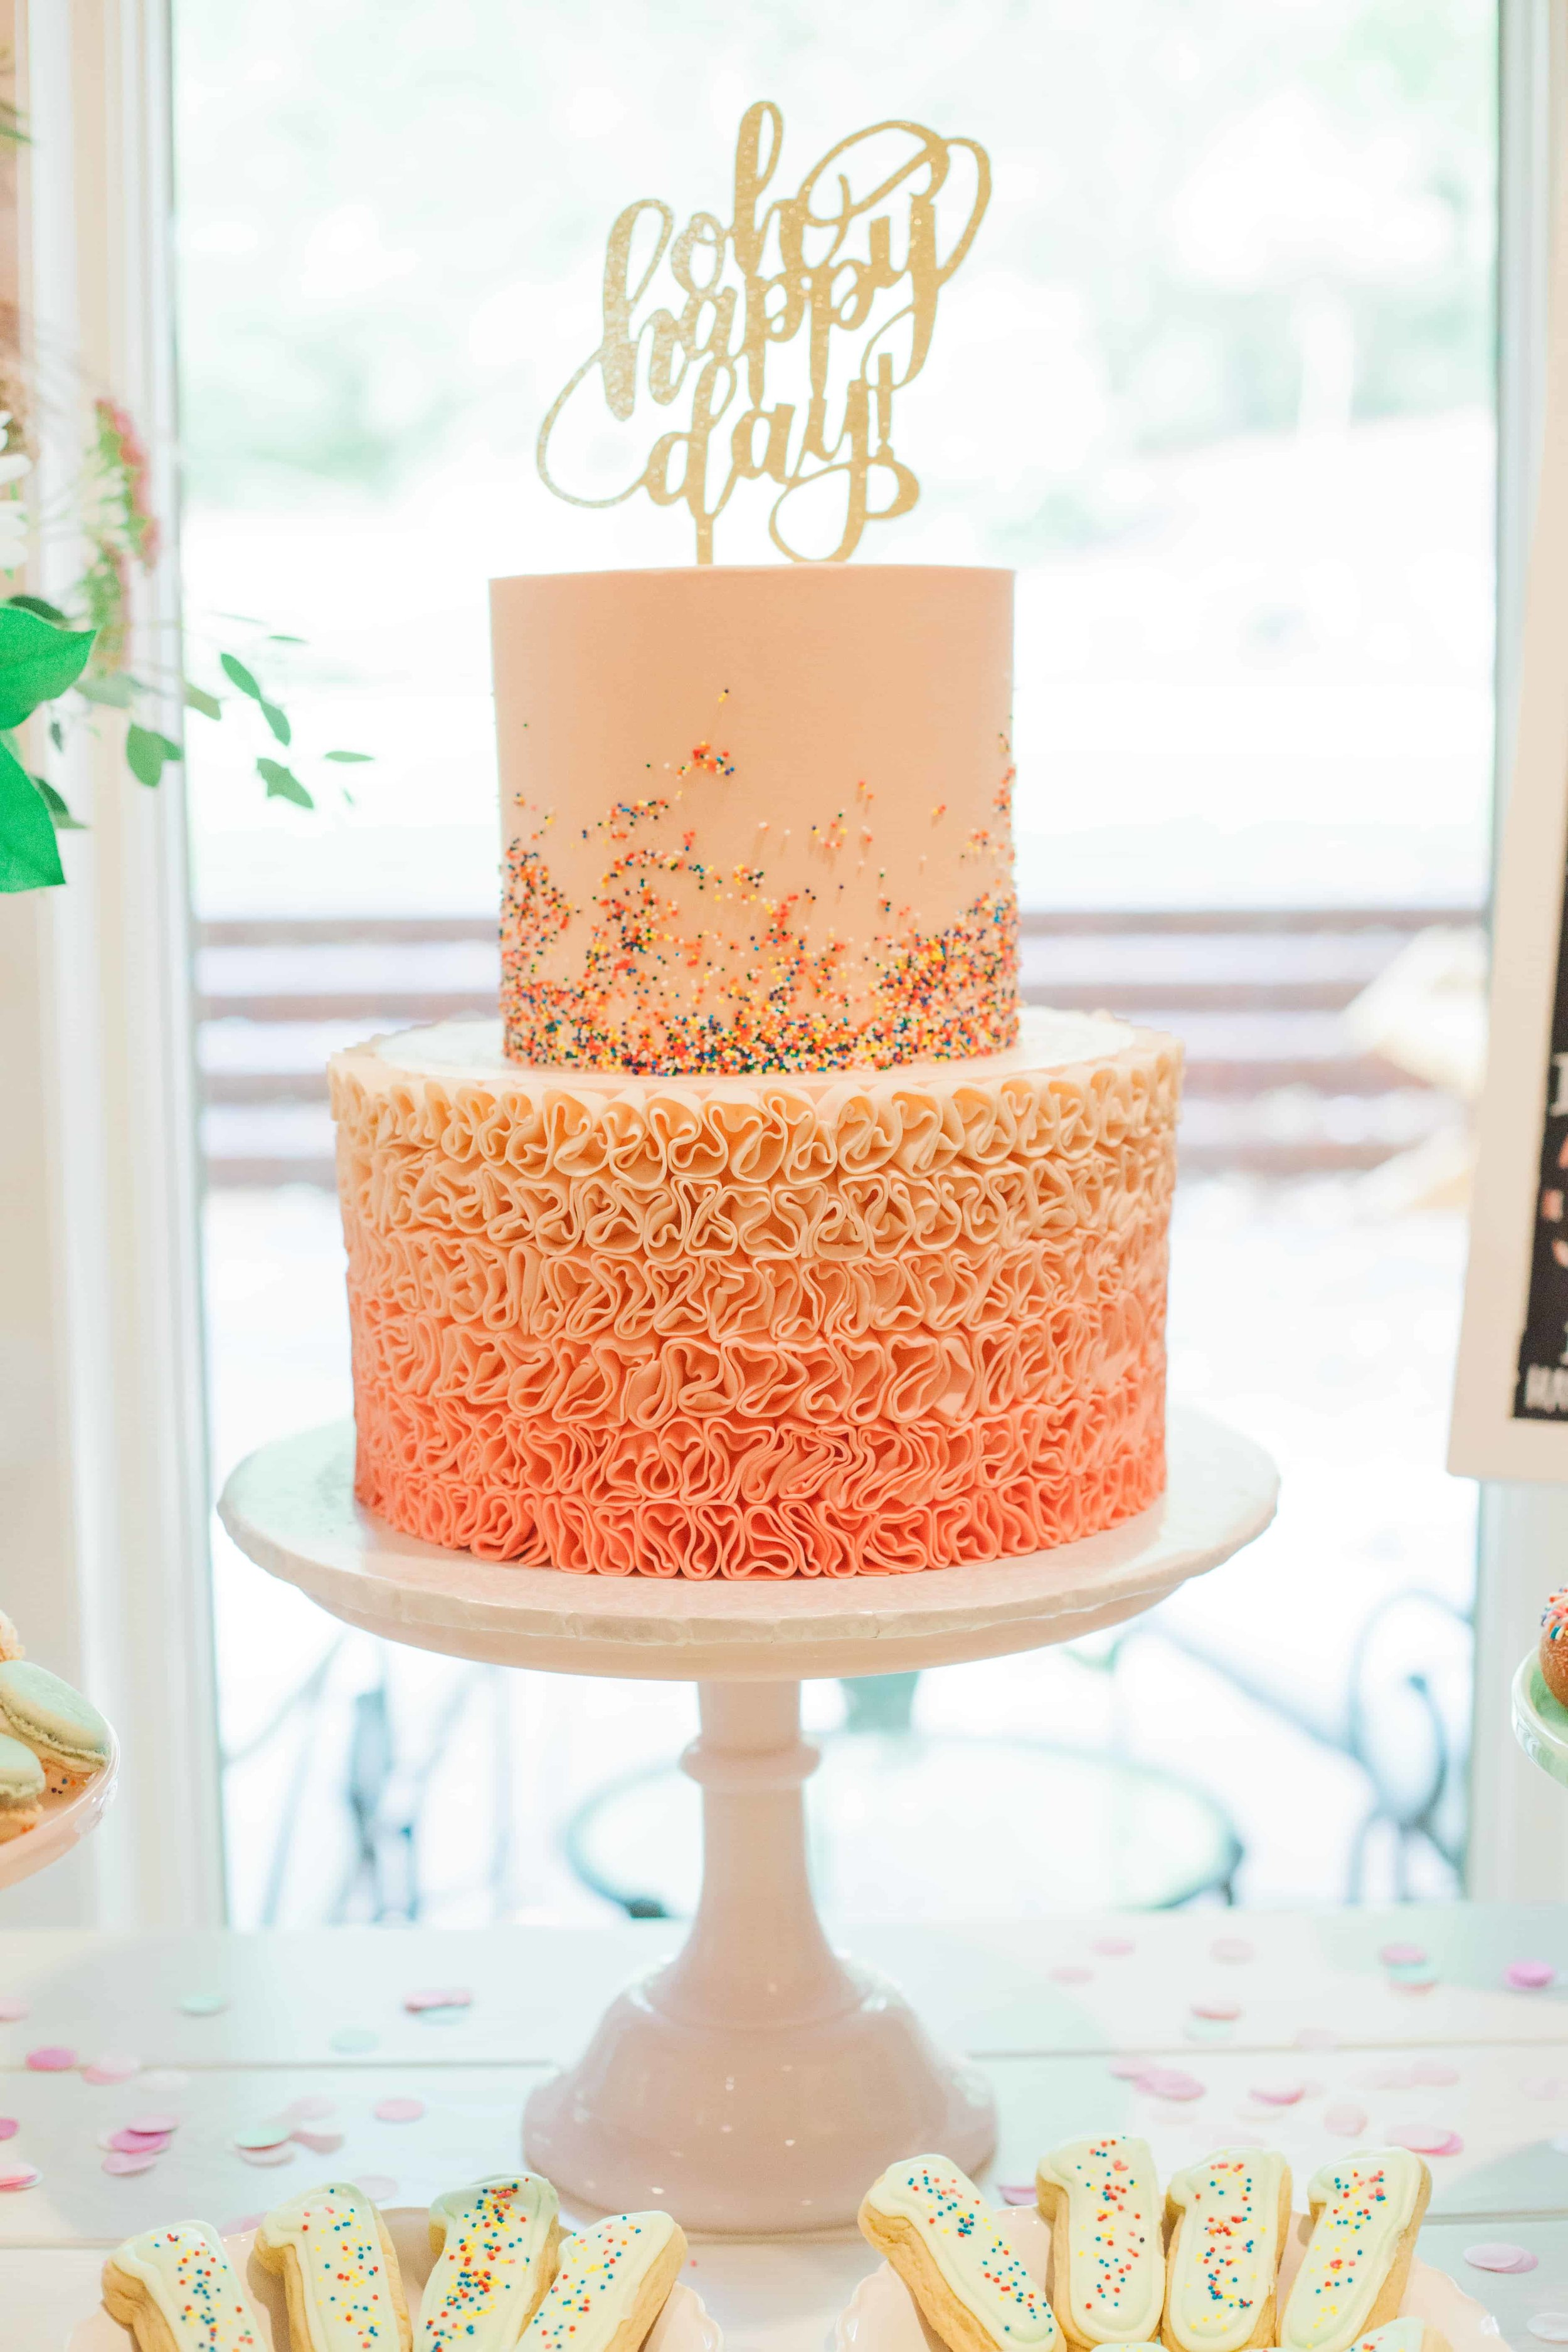 Hadley-First-Birthday-Oh-Happy-Day-Cake.jpg